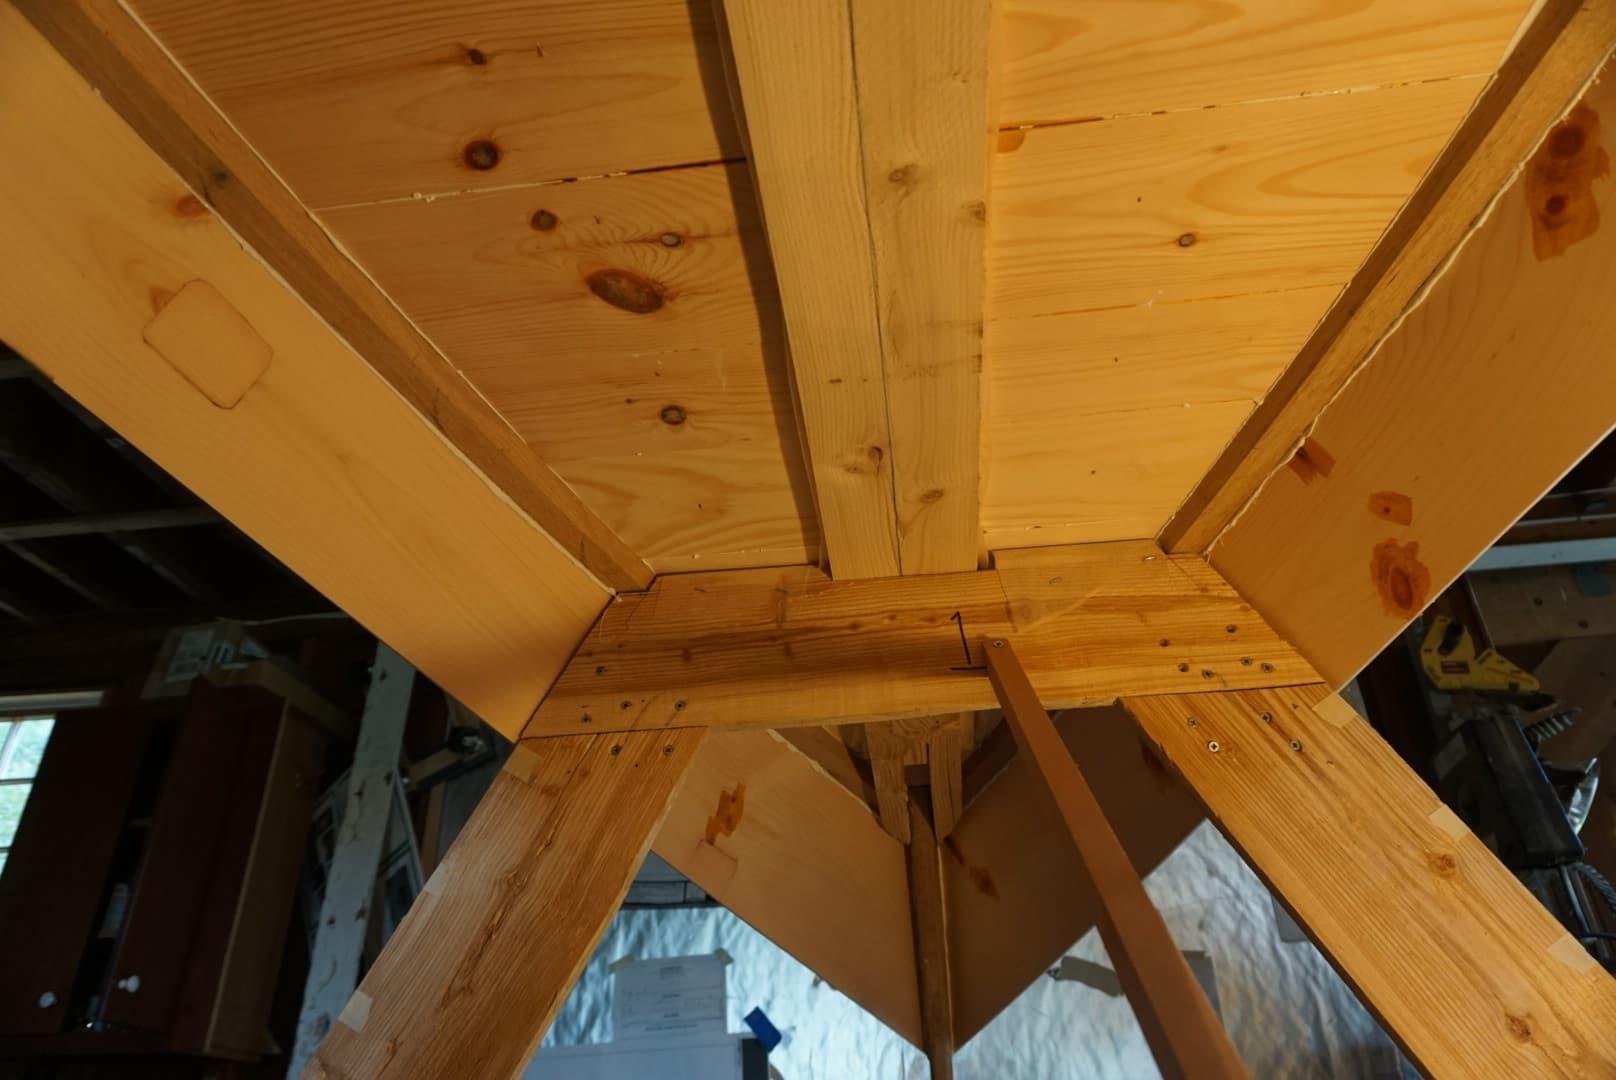 Yankee Tender underside, Weeping Willow Woodworks in Cummaquid, MA